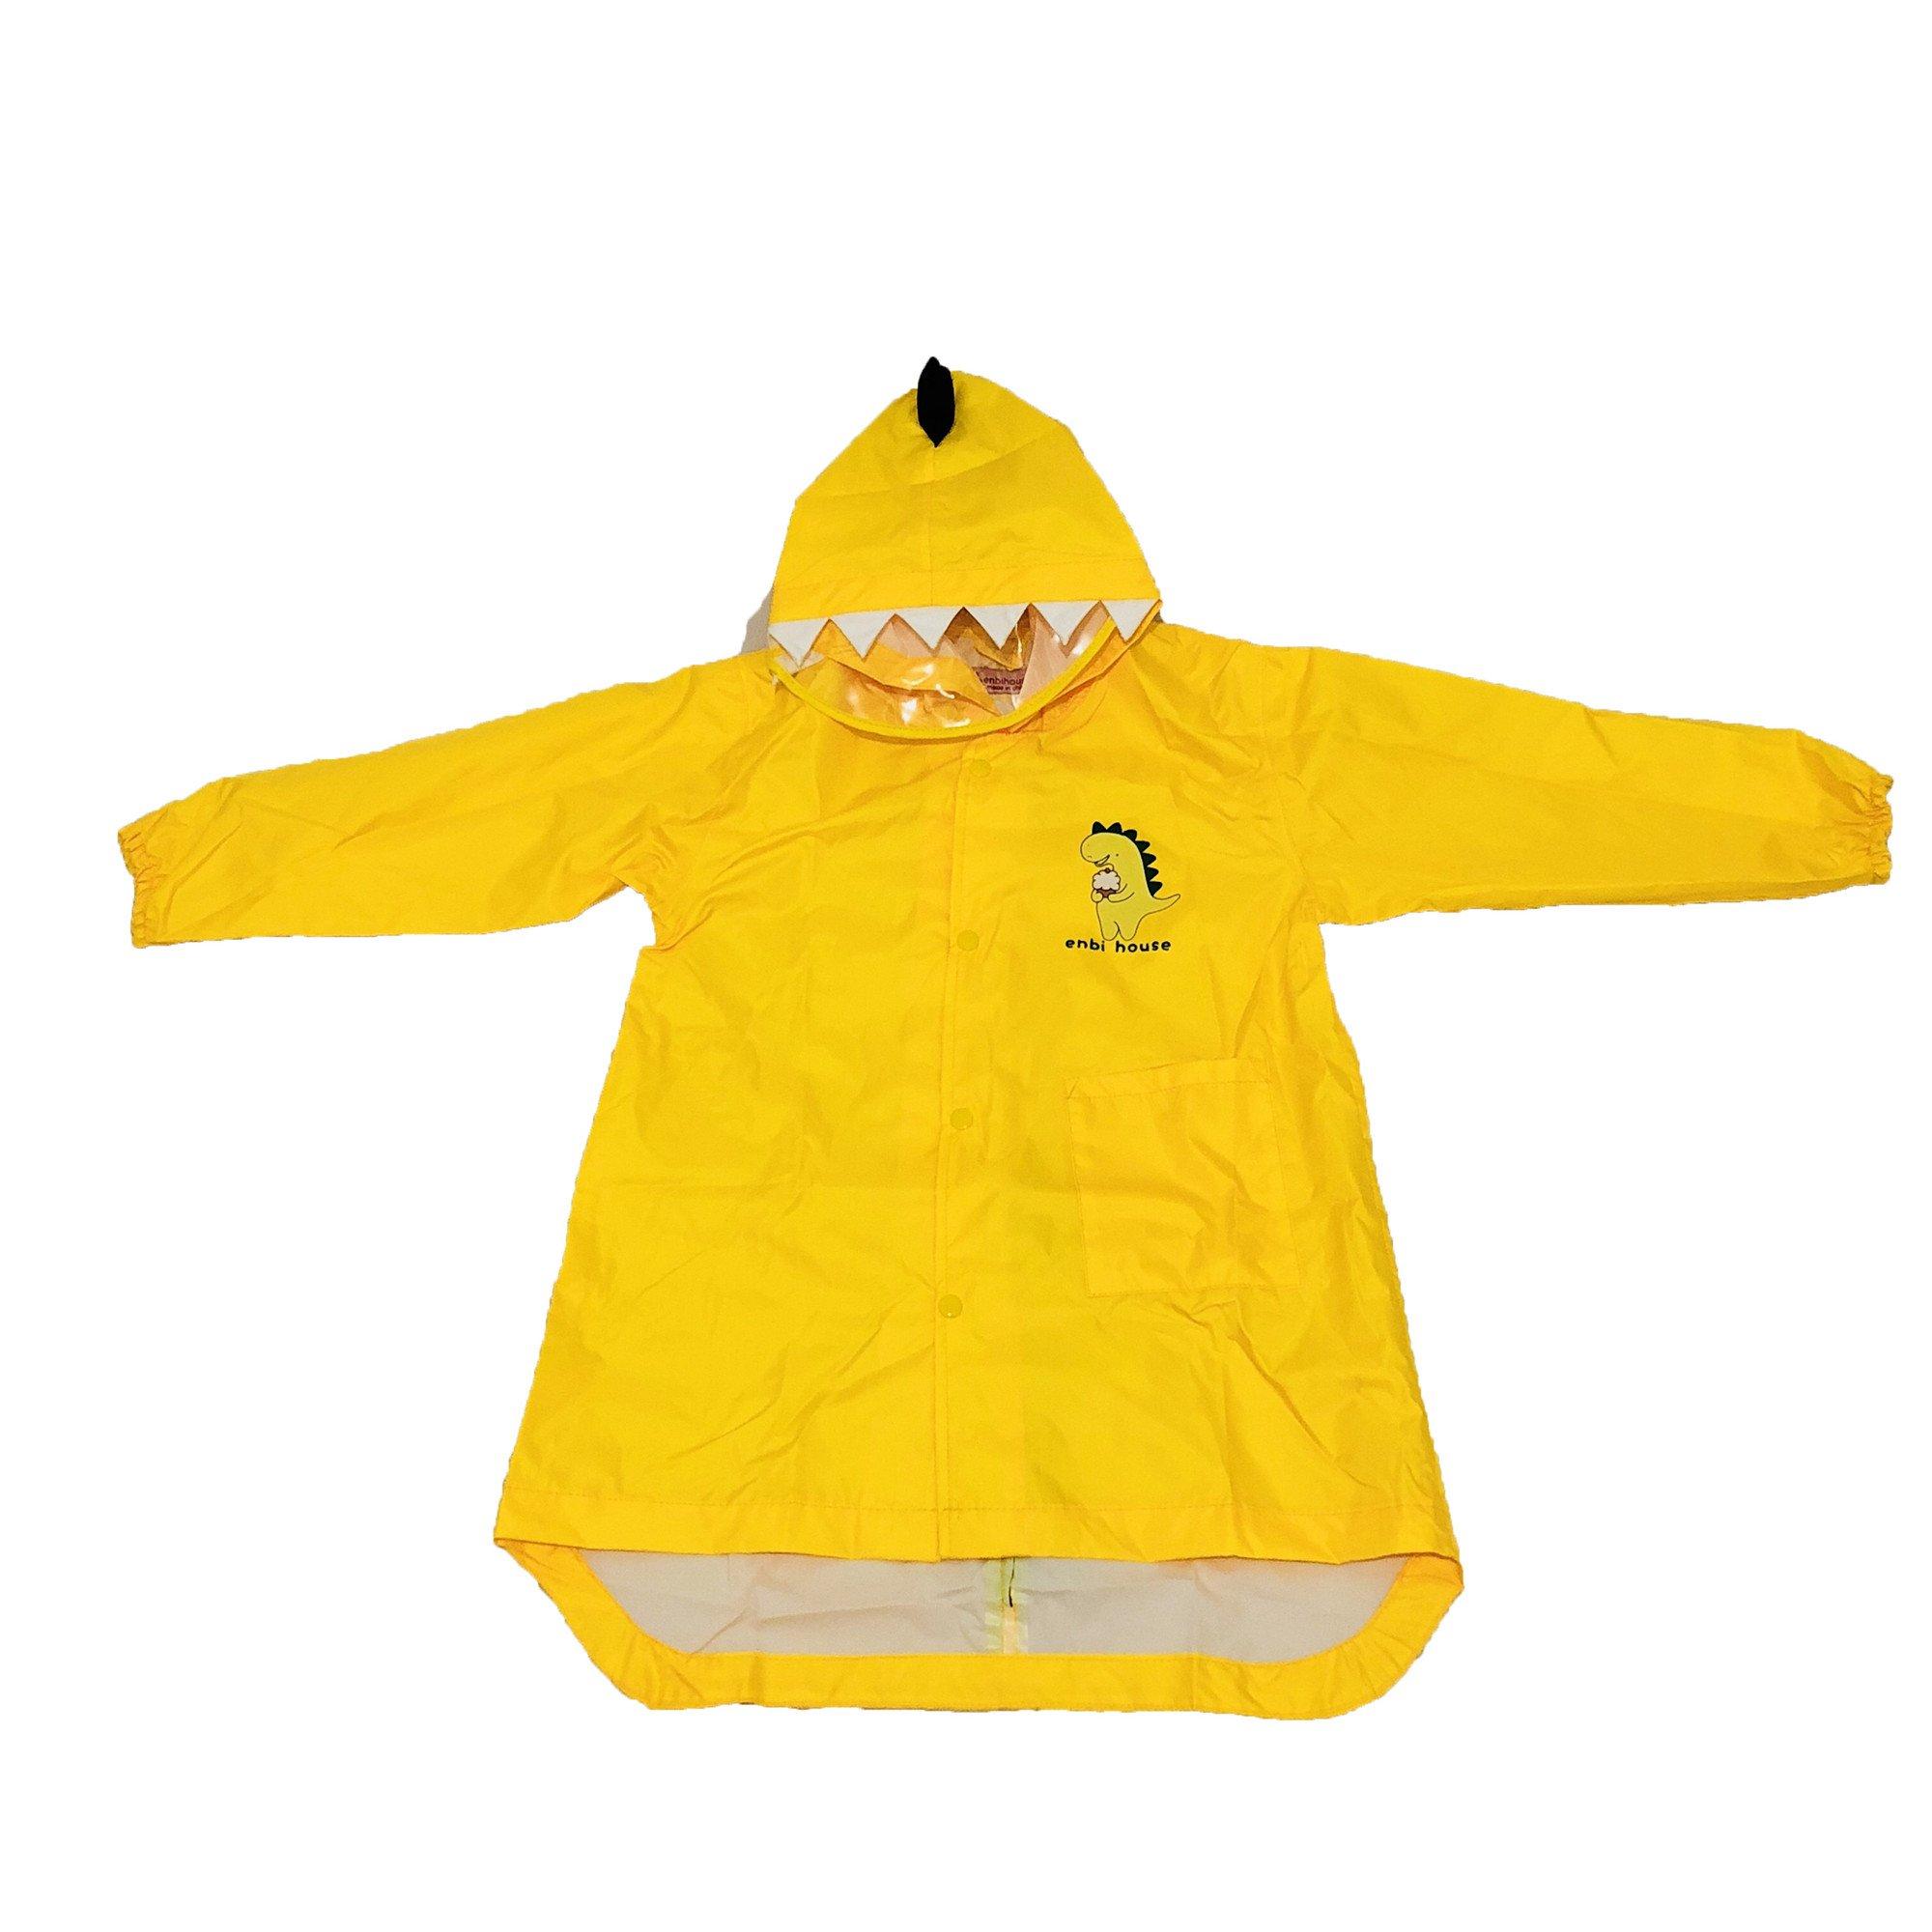 SEALOVESFLOWER Yellow Dinosaur Raincoat For Kids Rain Jacket Lightweight Rainwear For Boy and Girl (L)